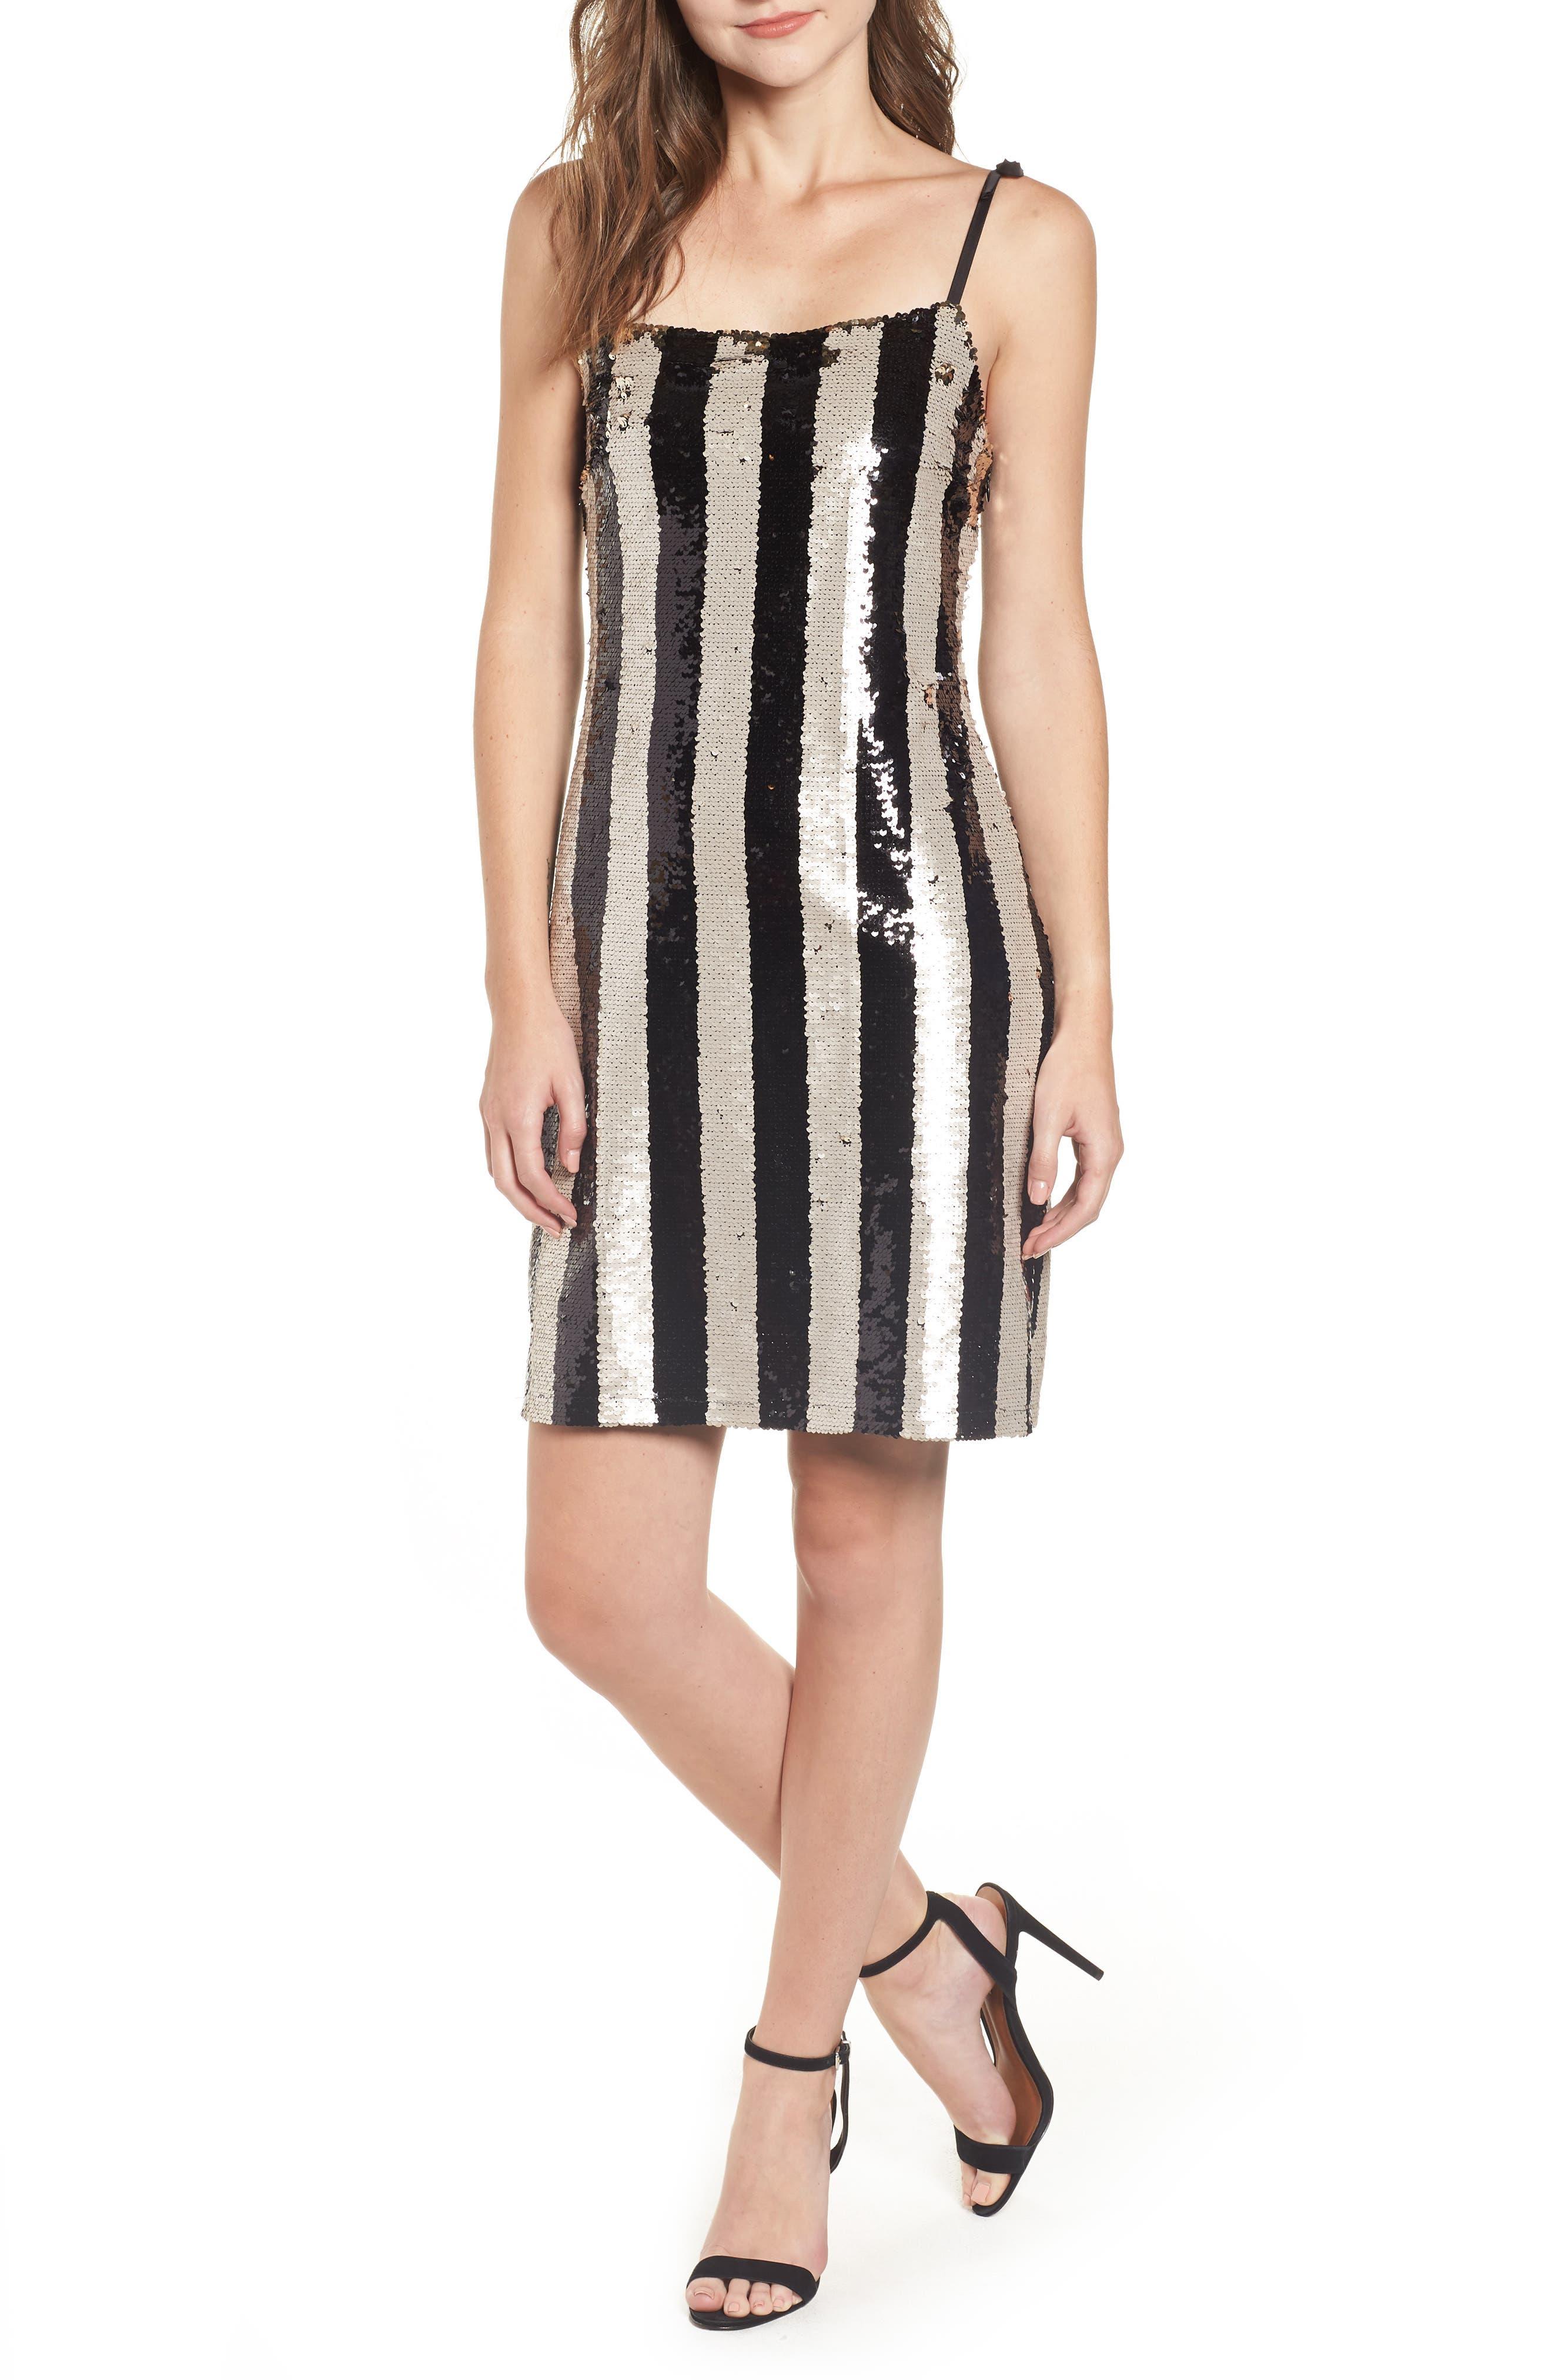 CUPCAKES AND CASHMERE, Vertical Sequin Stripe Dress, Main thumbnail 1, color, BLACK